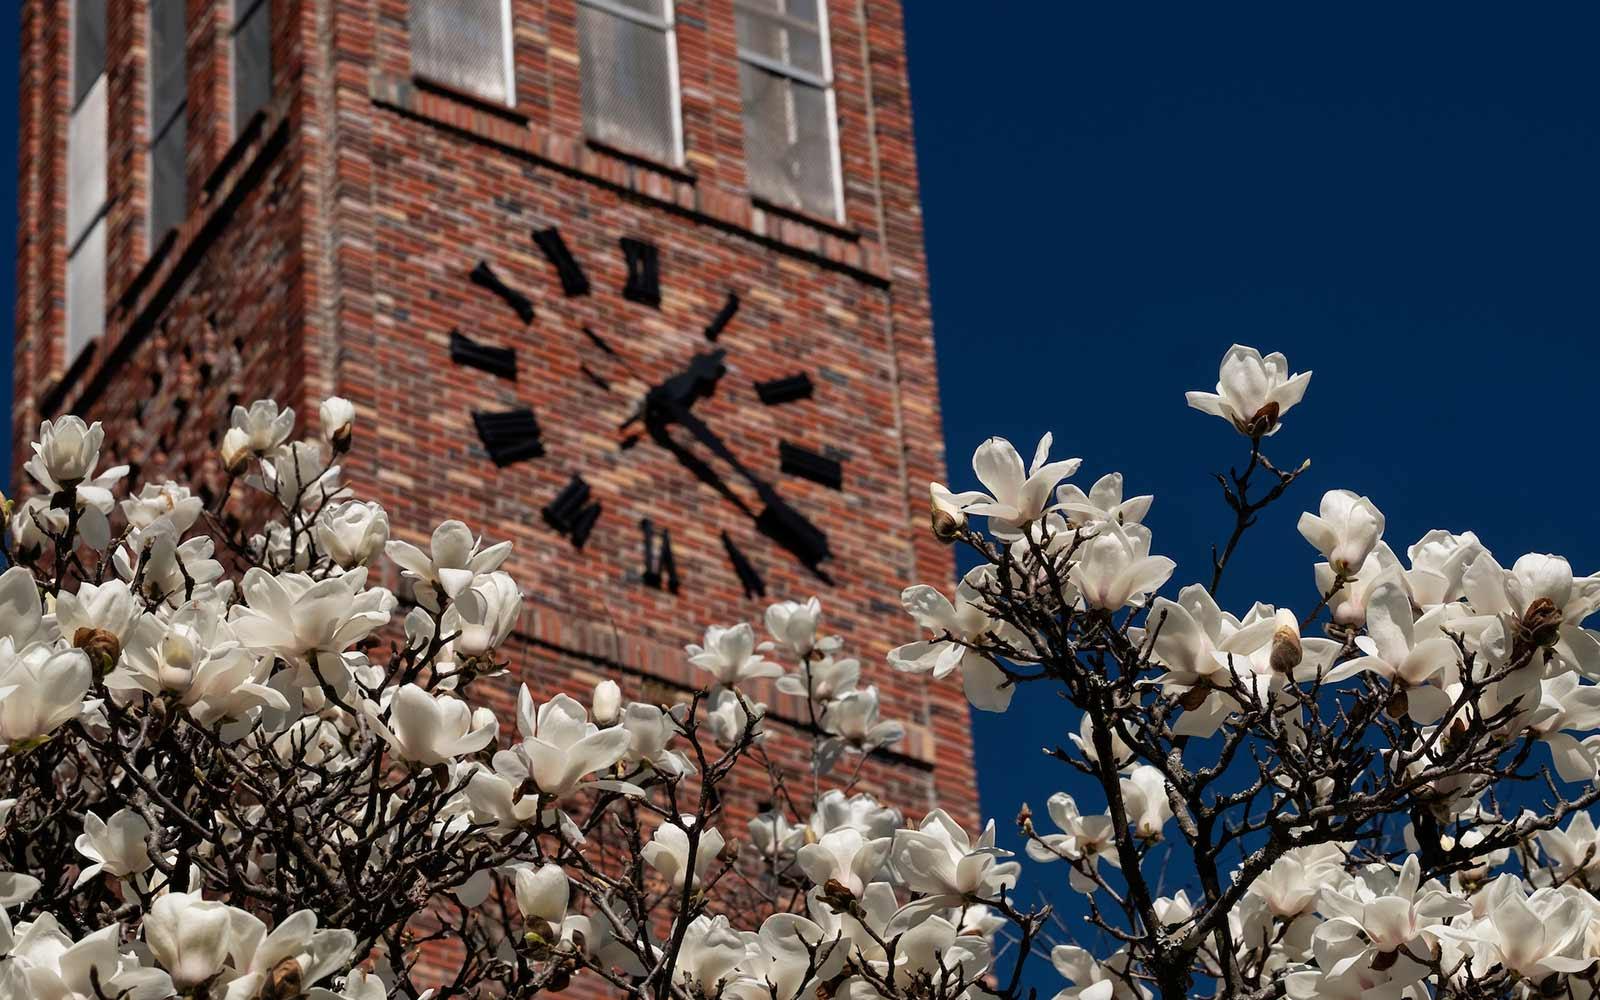 MSU revises Spring 2021 academic calendar amid COVID 19